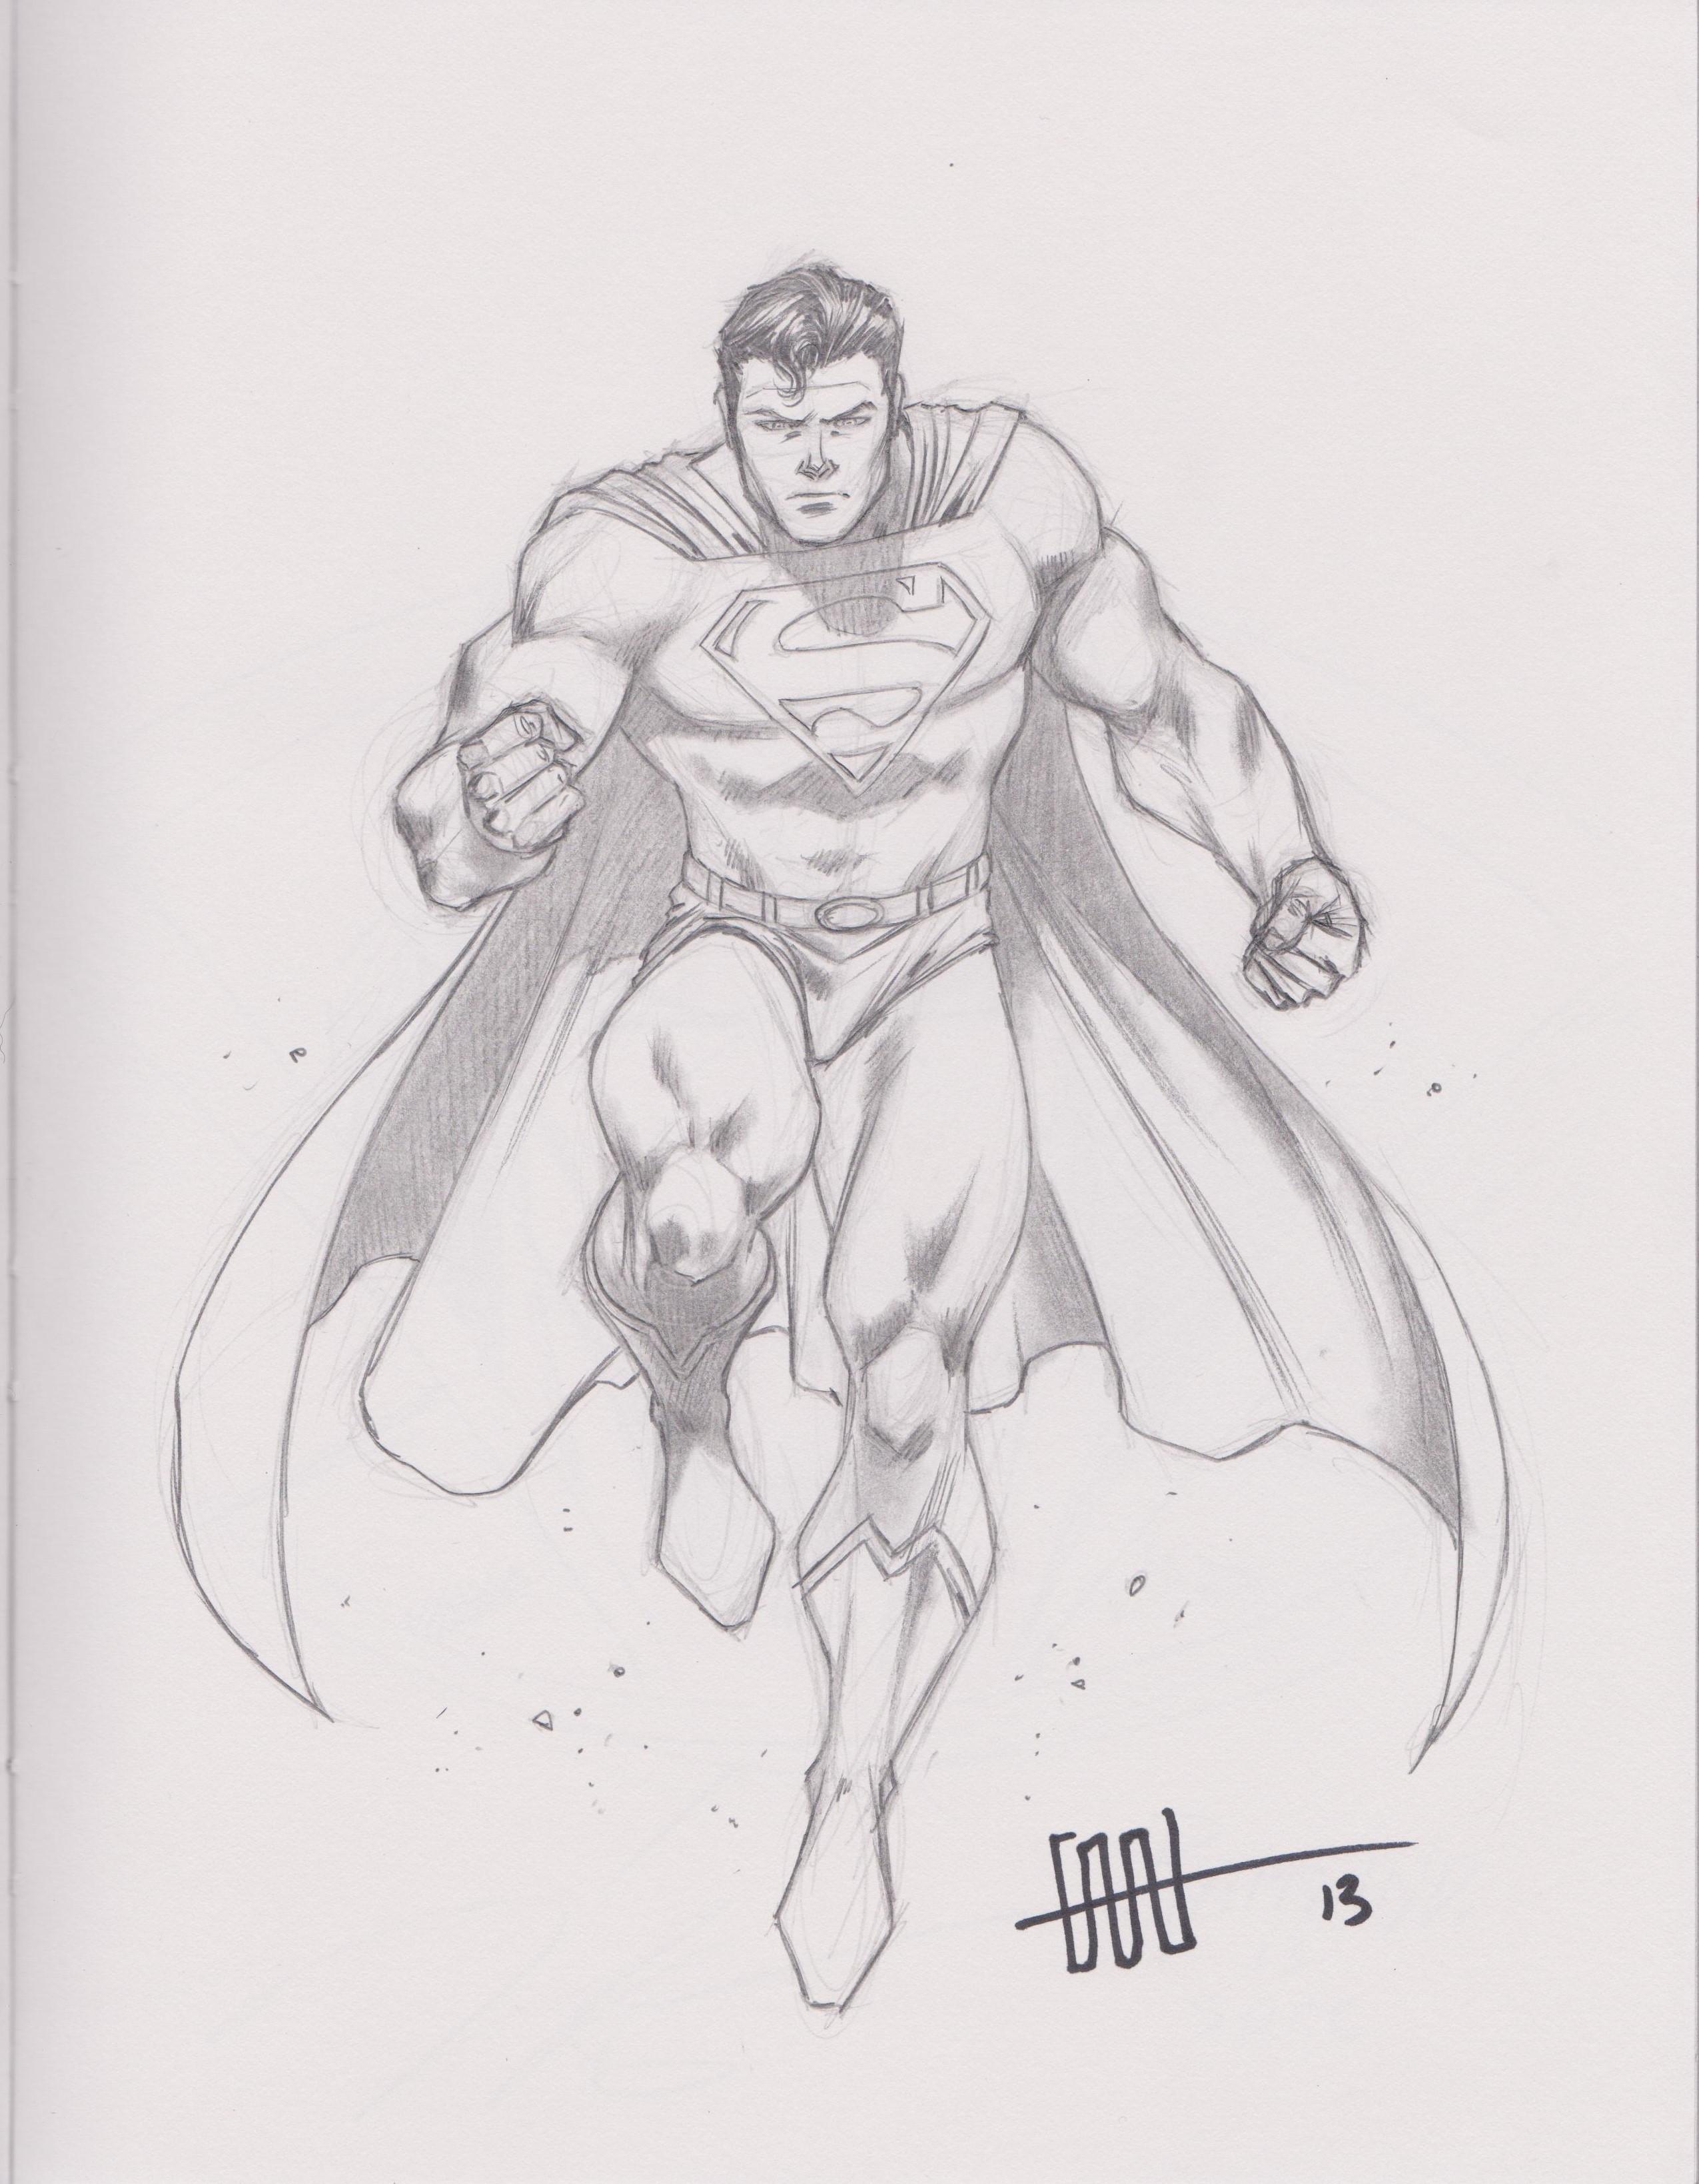 Superman by Cafu